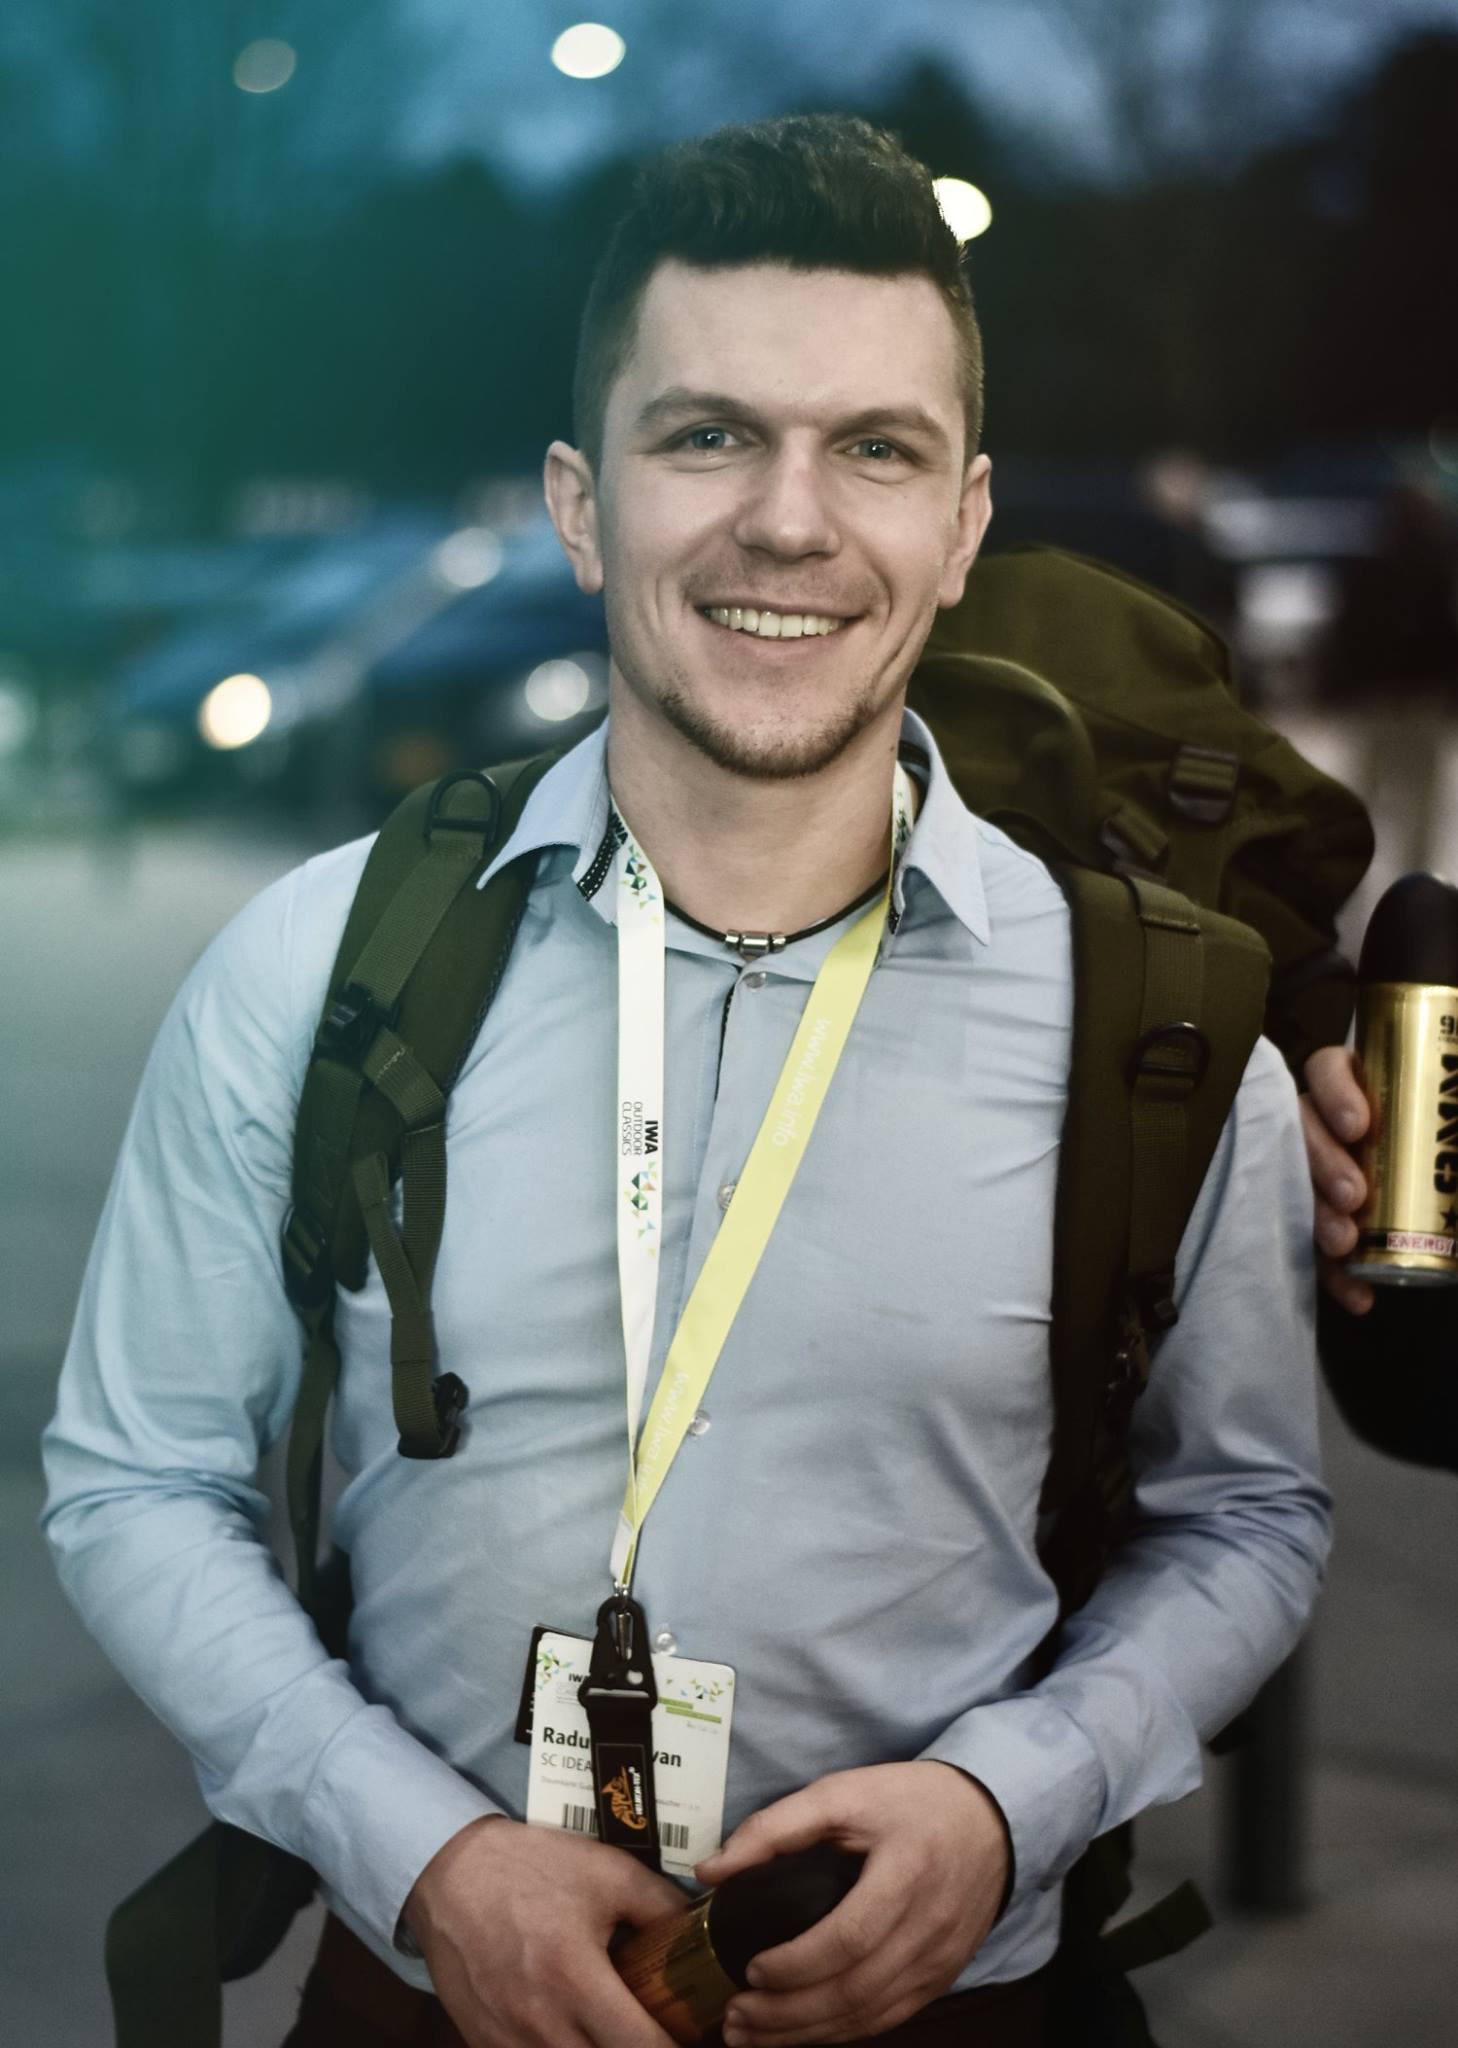 Radu Bukowan Airsoft Maniac